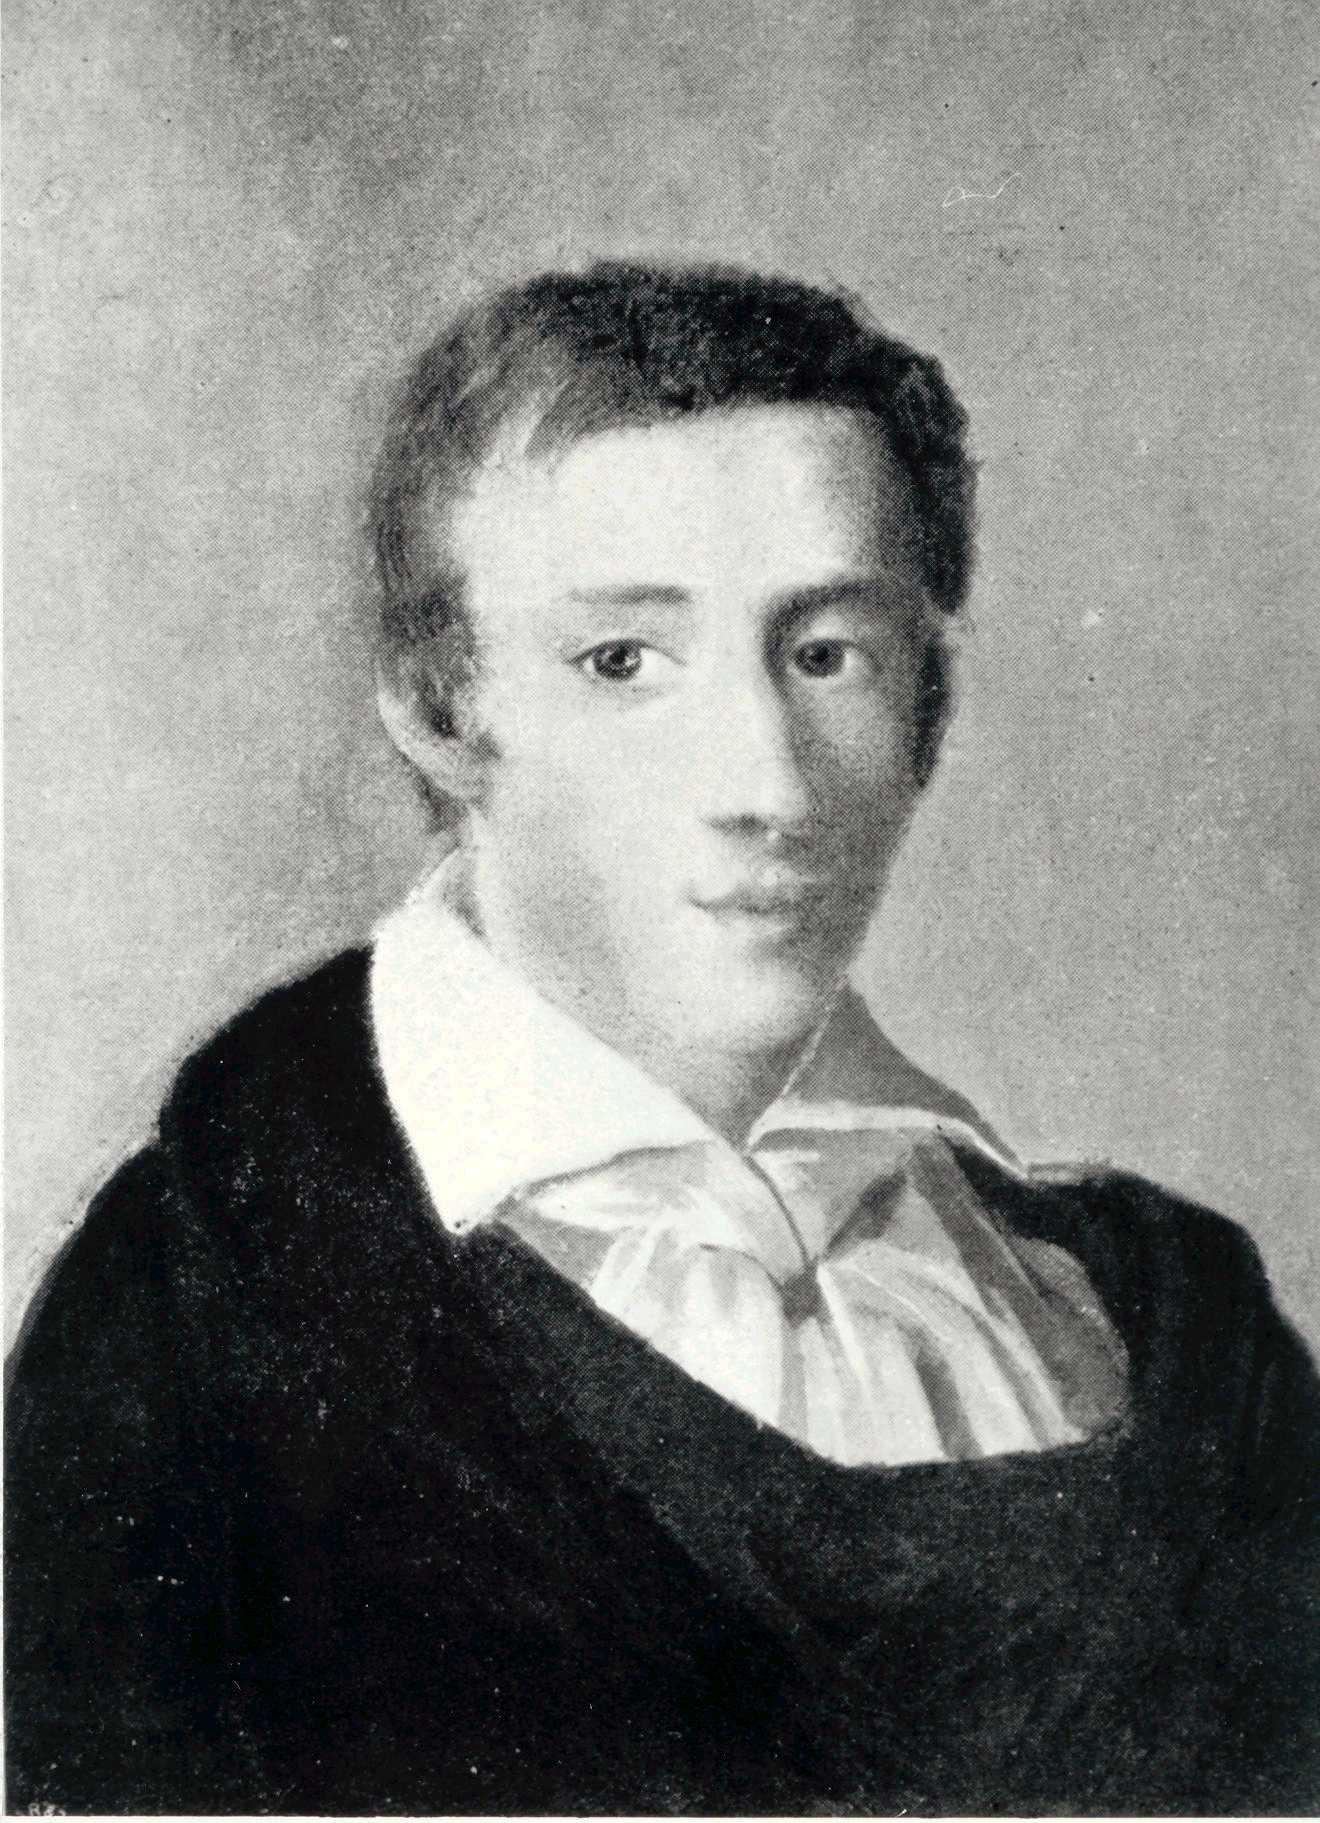 Chopin en 1829, obra de Ambroży Mieroszewski